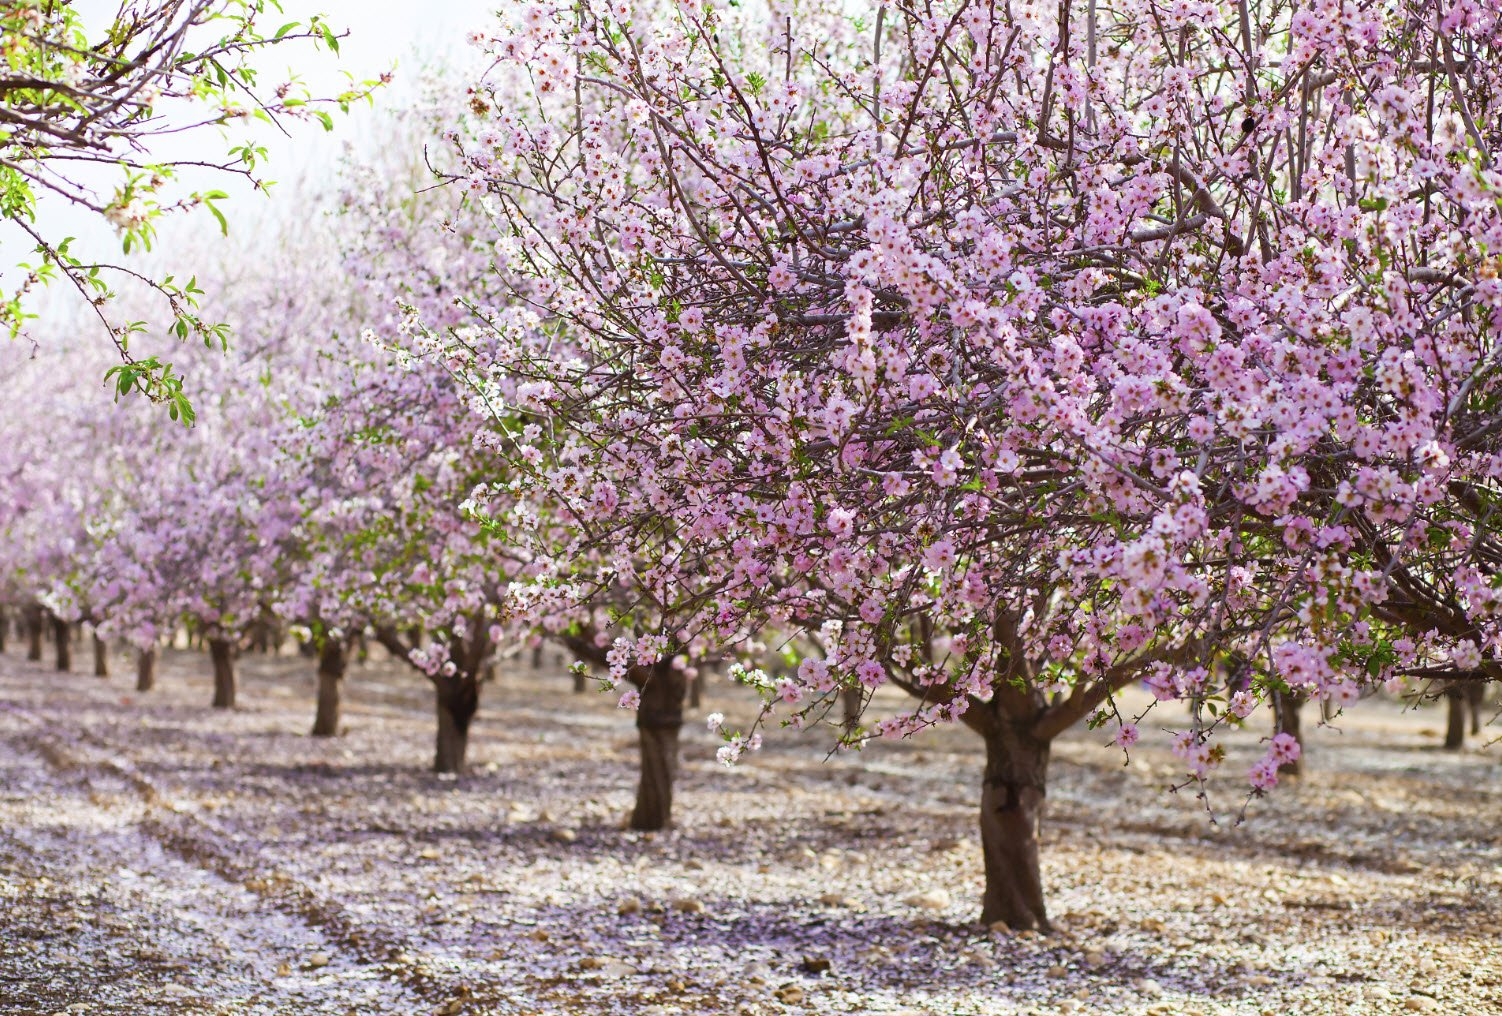 фото цветущего миндаля в испании